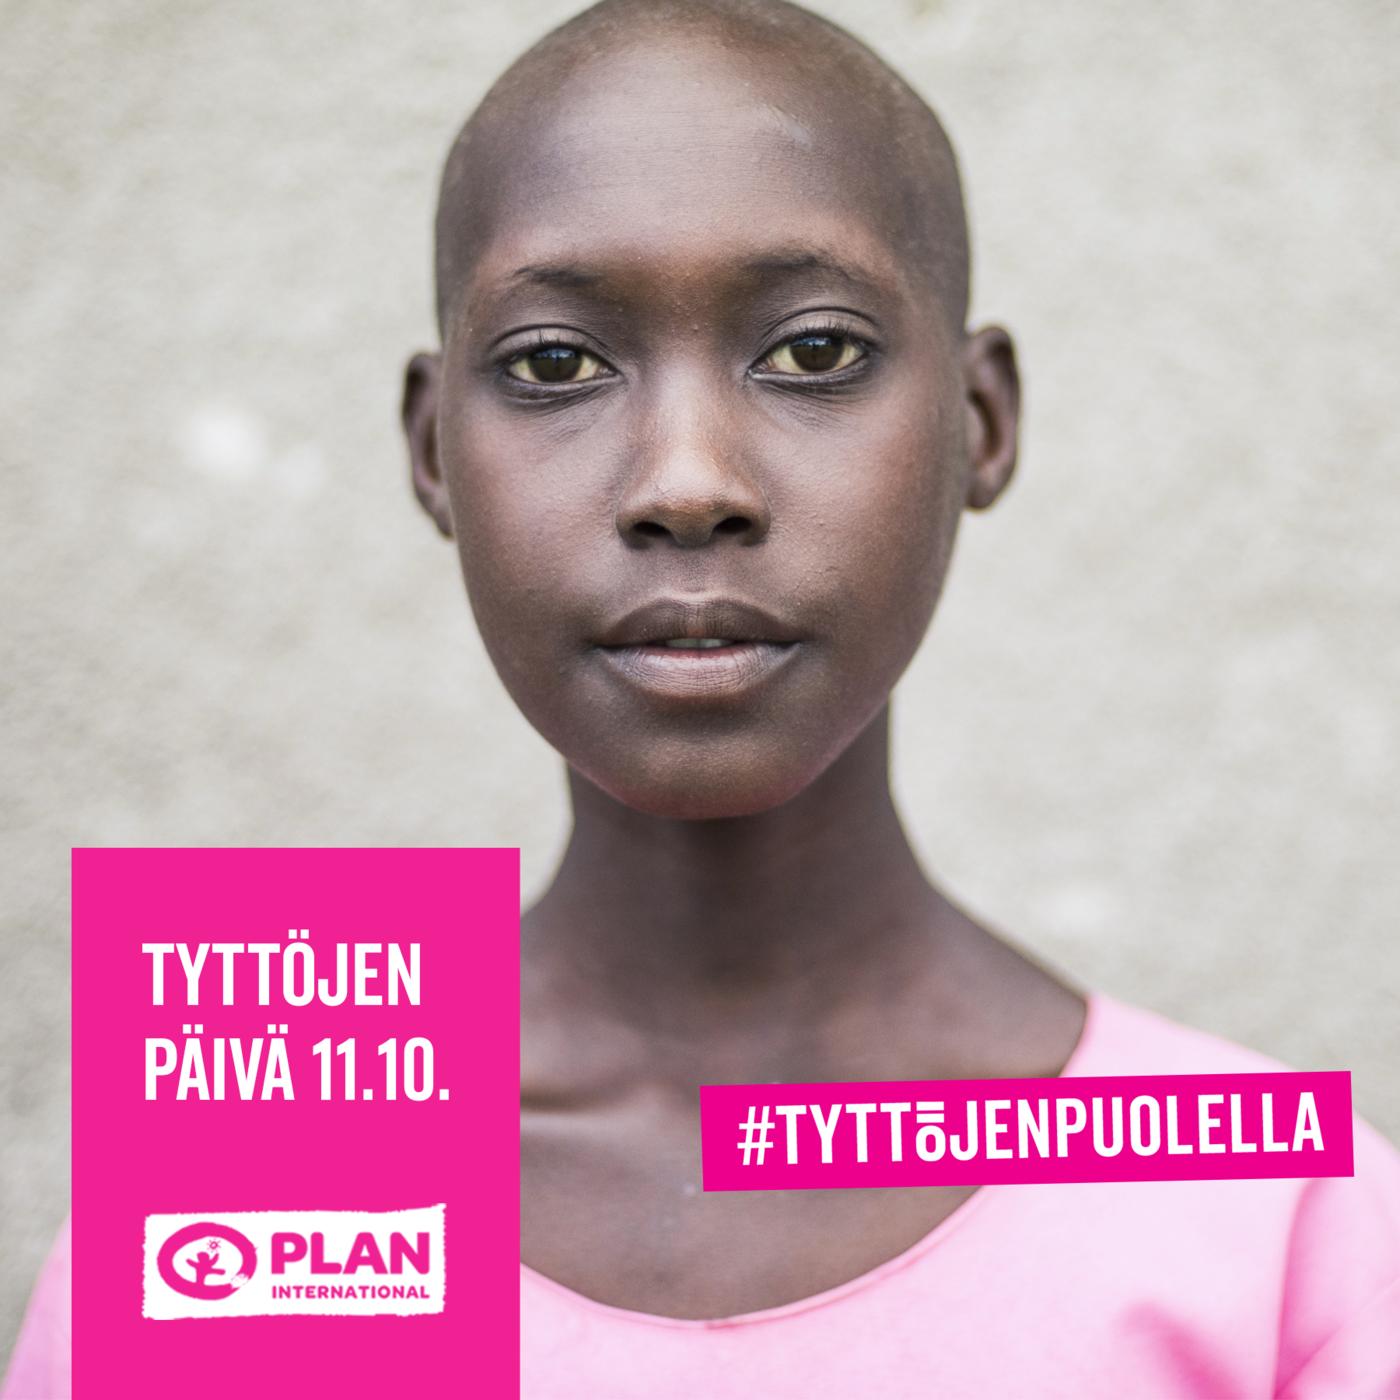 Plan-tyttojenpaiva-2018_tytto2_1080x1080.png